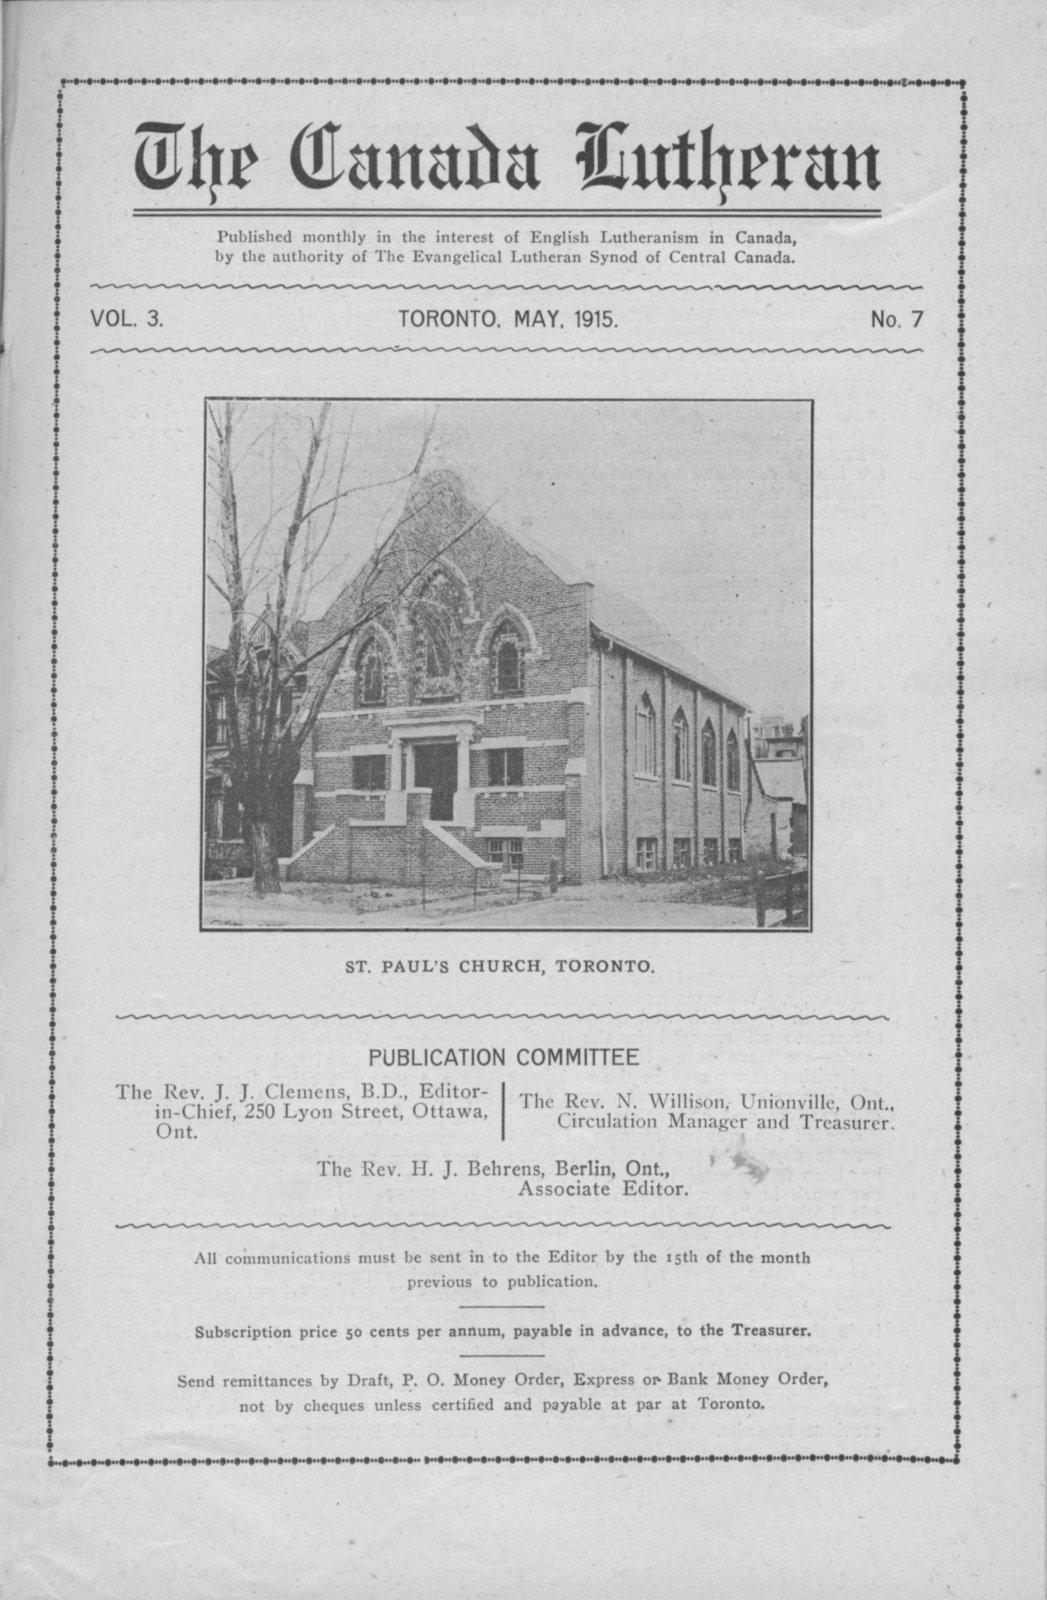 The Canada Lutheran, vol. 3, no. 7, May 1915